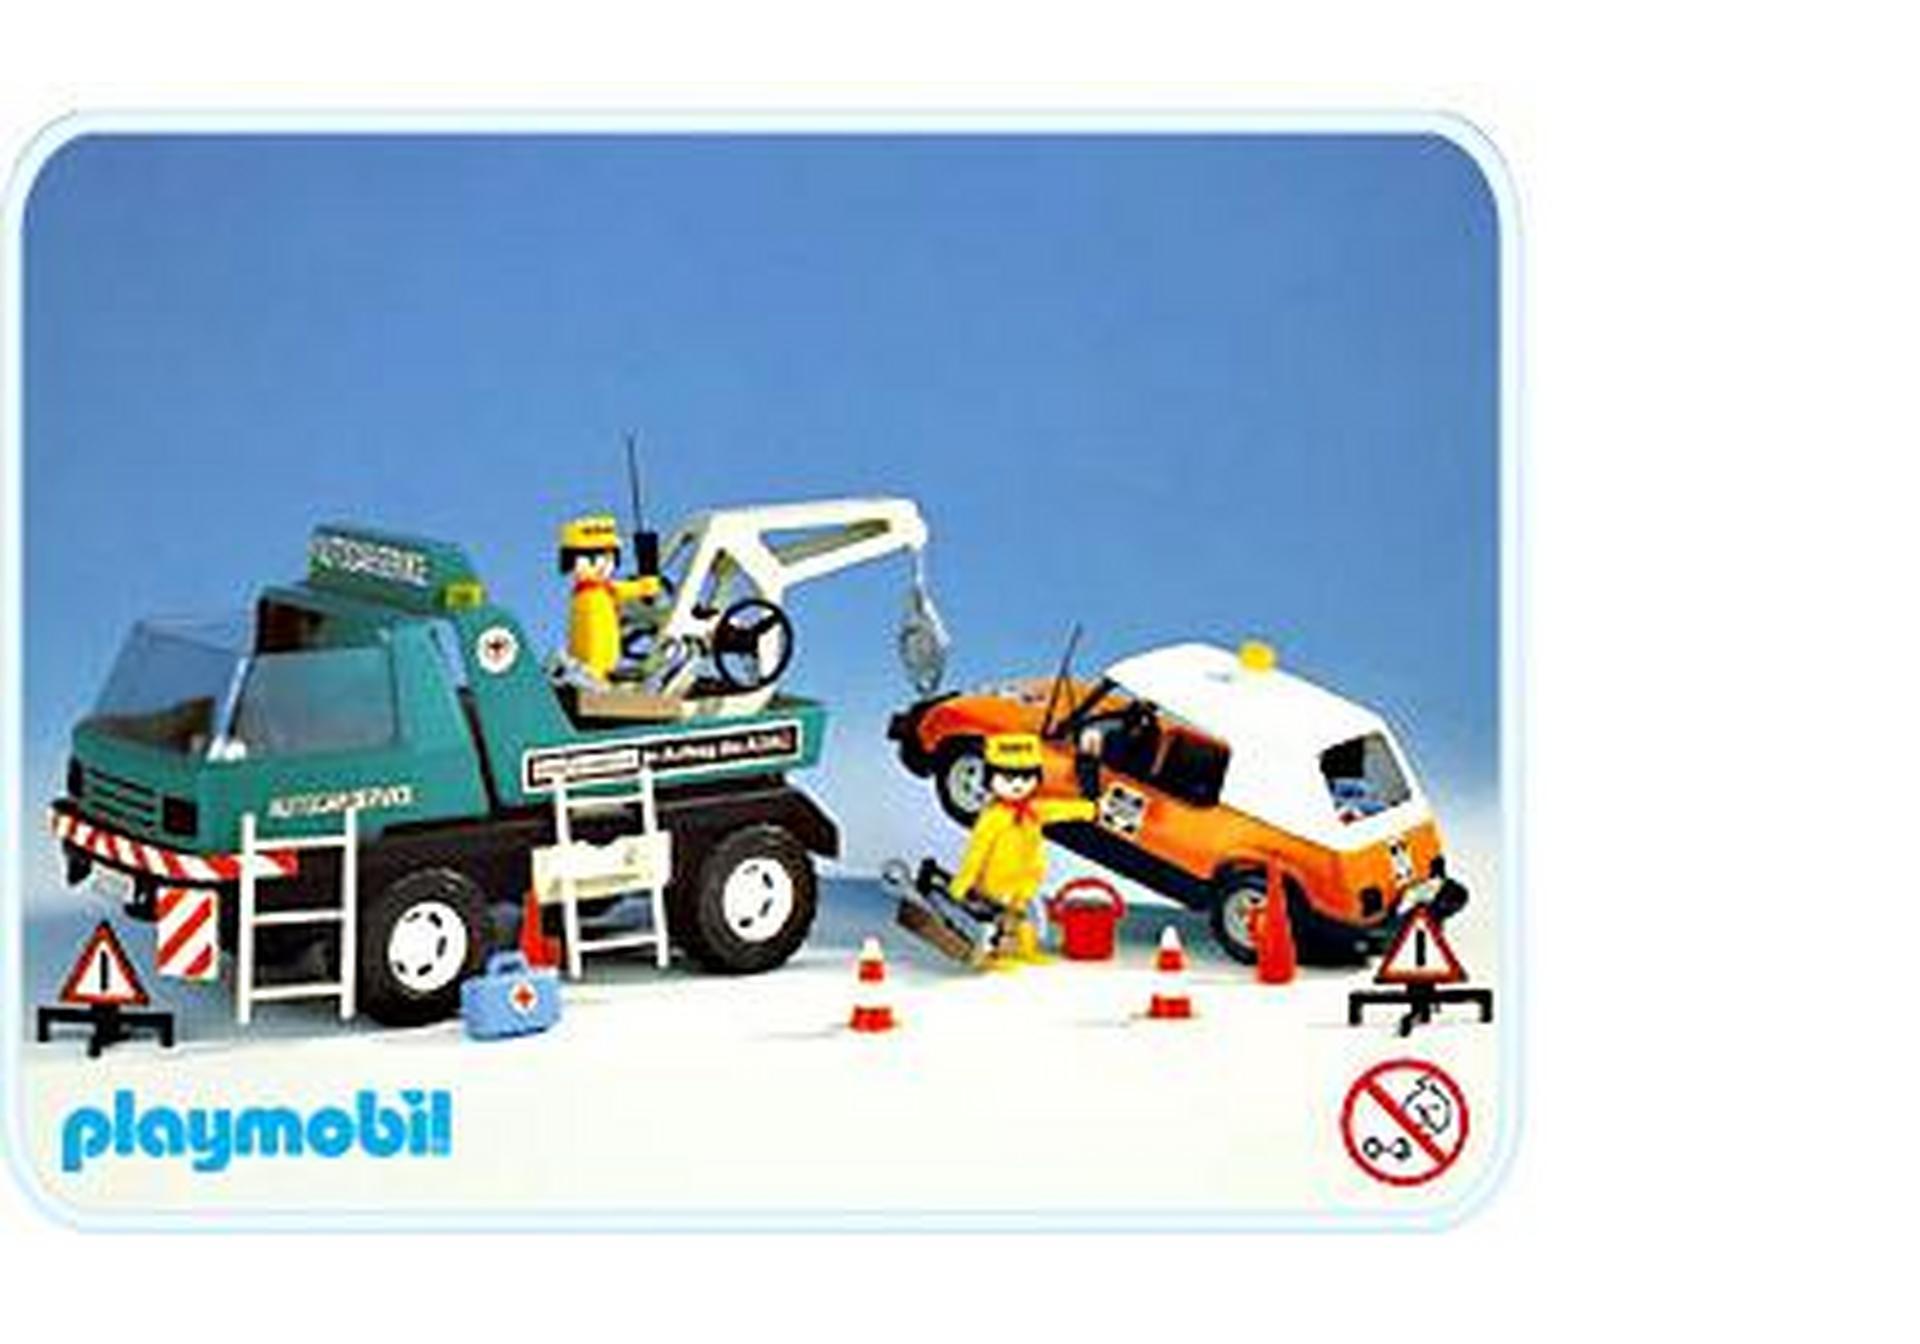 - Autocar playmobil ...